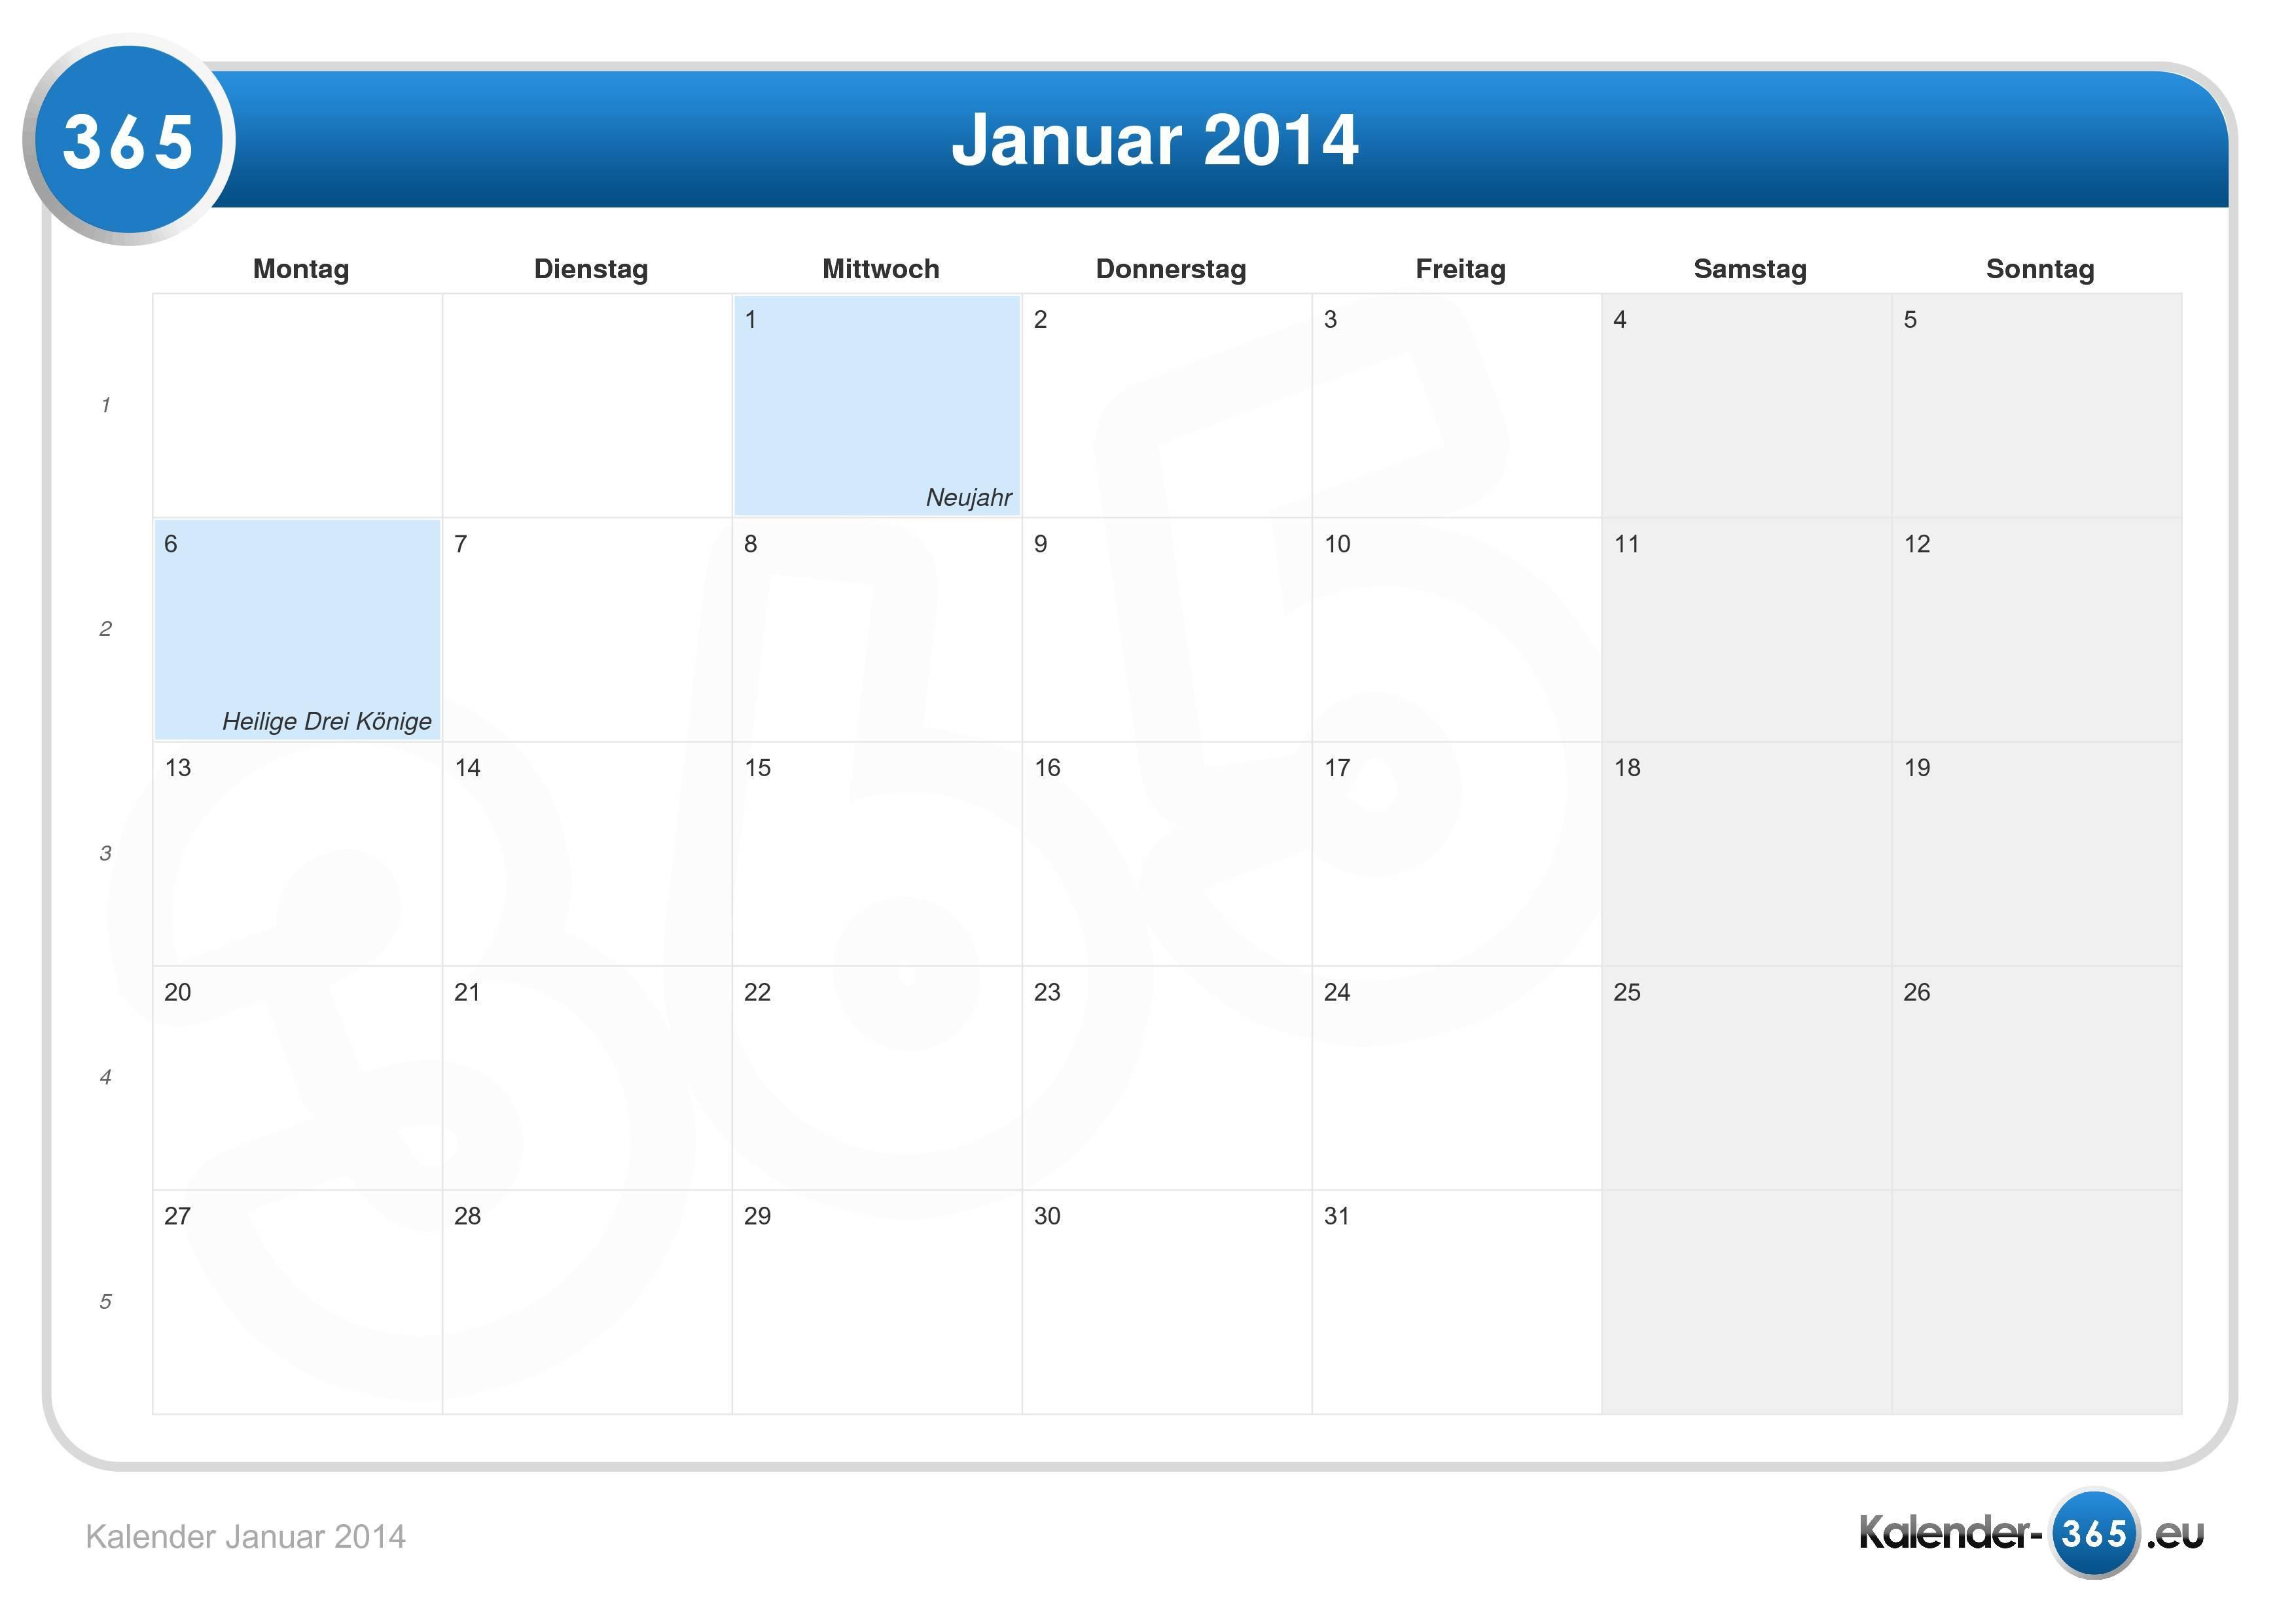 Kalender Januar 2014